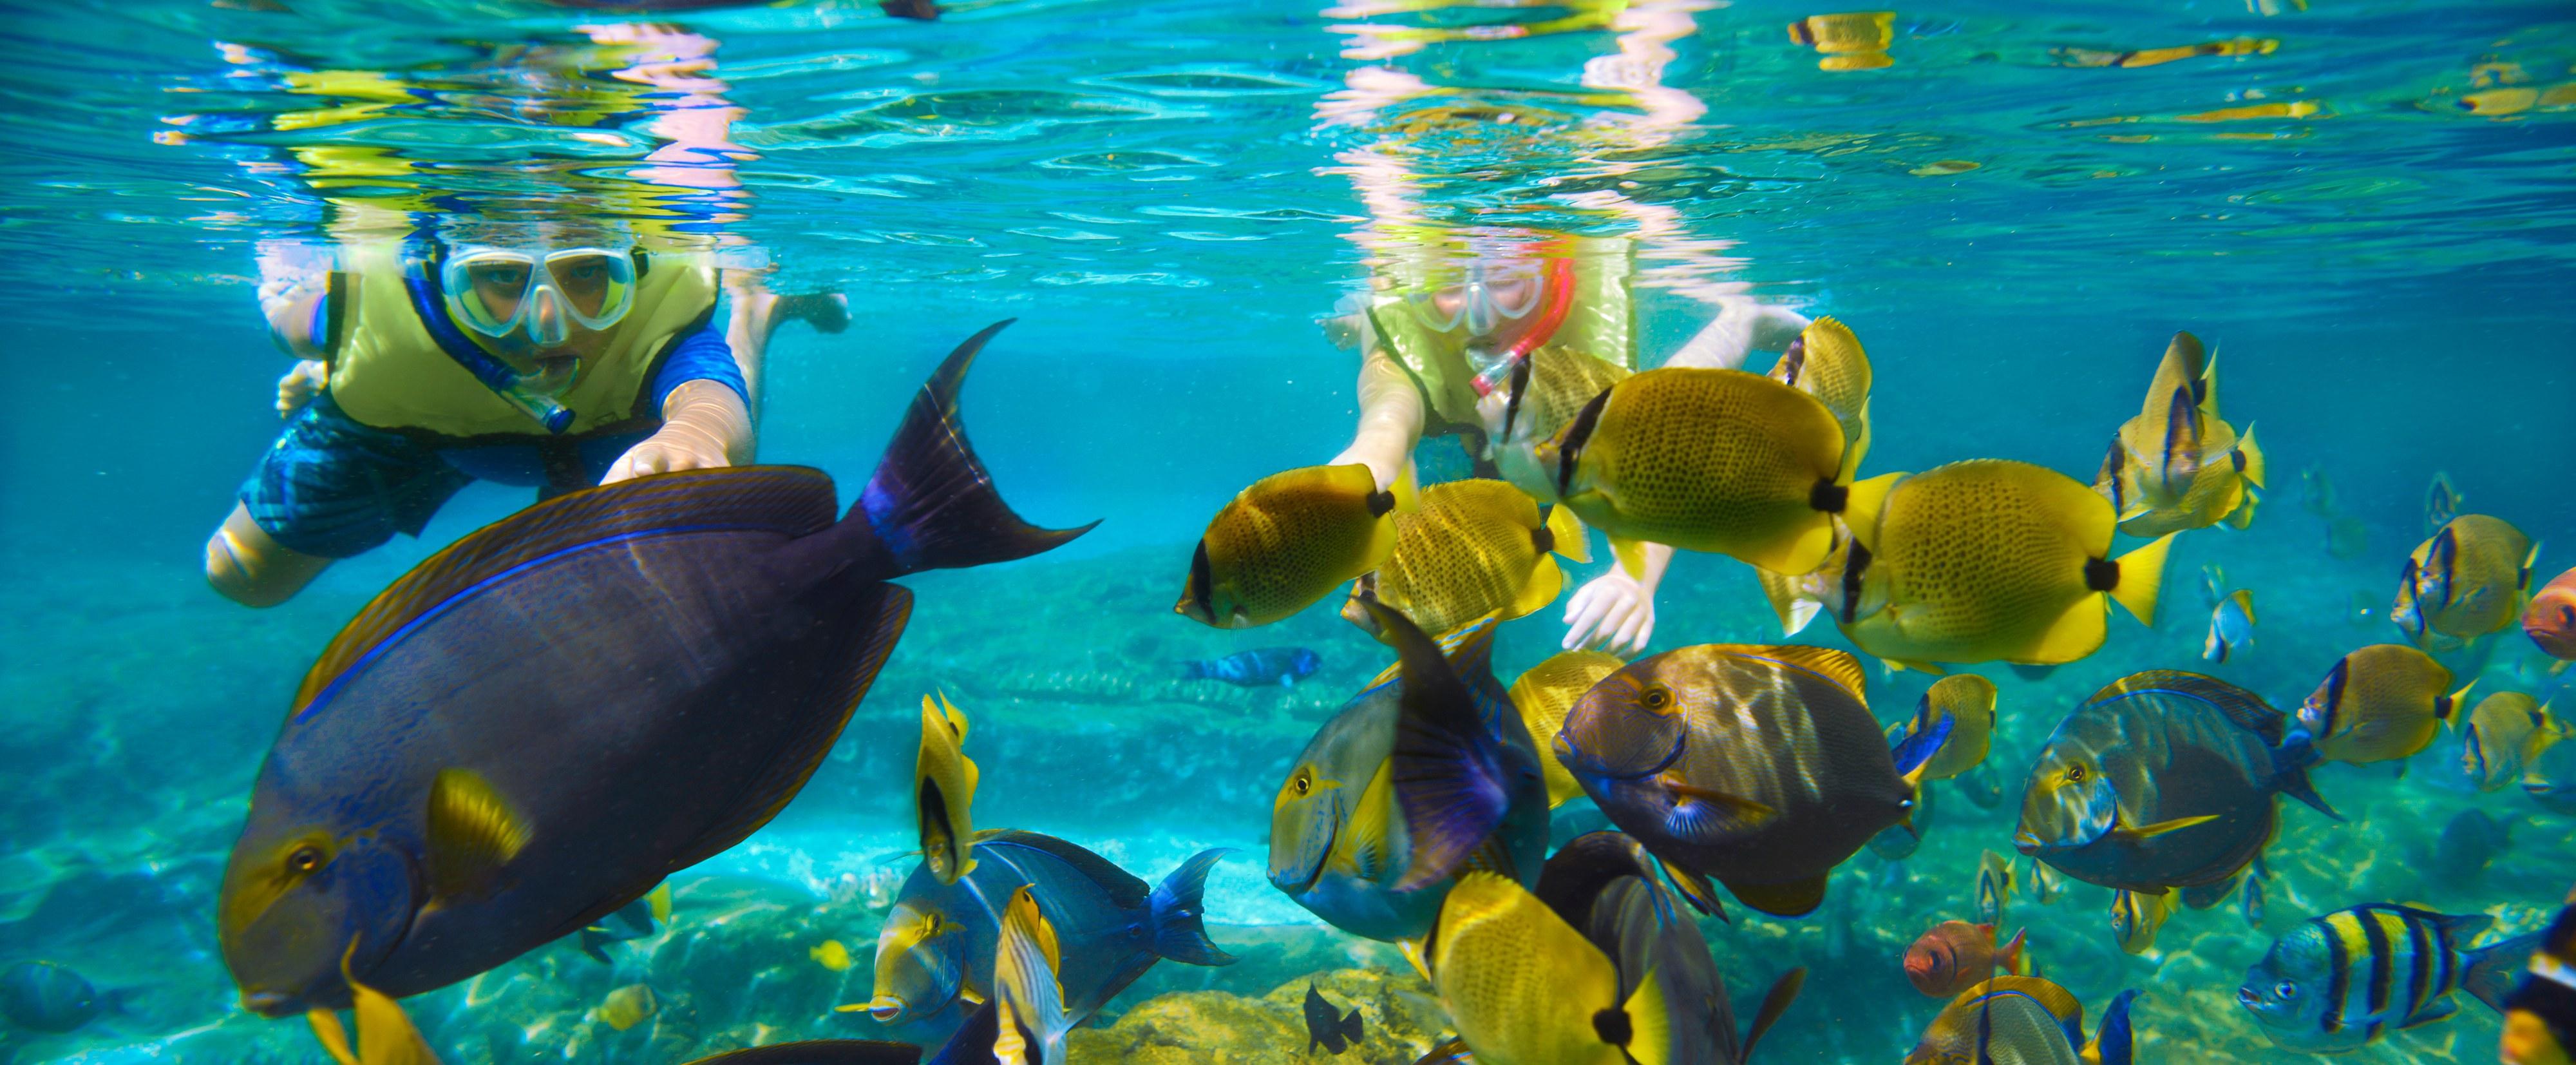 Snorkeling (Source:disney.com)